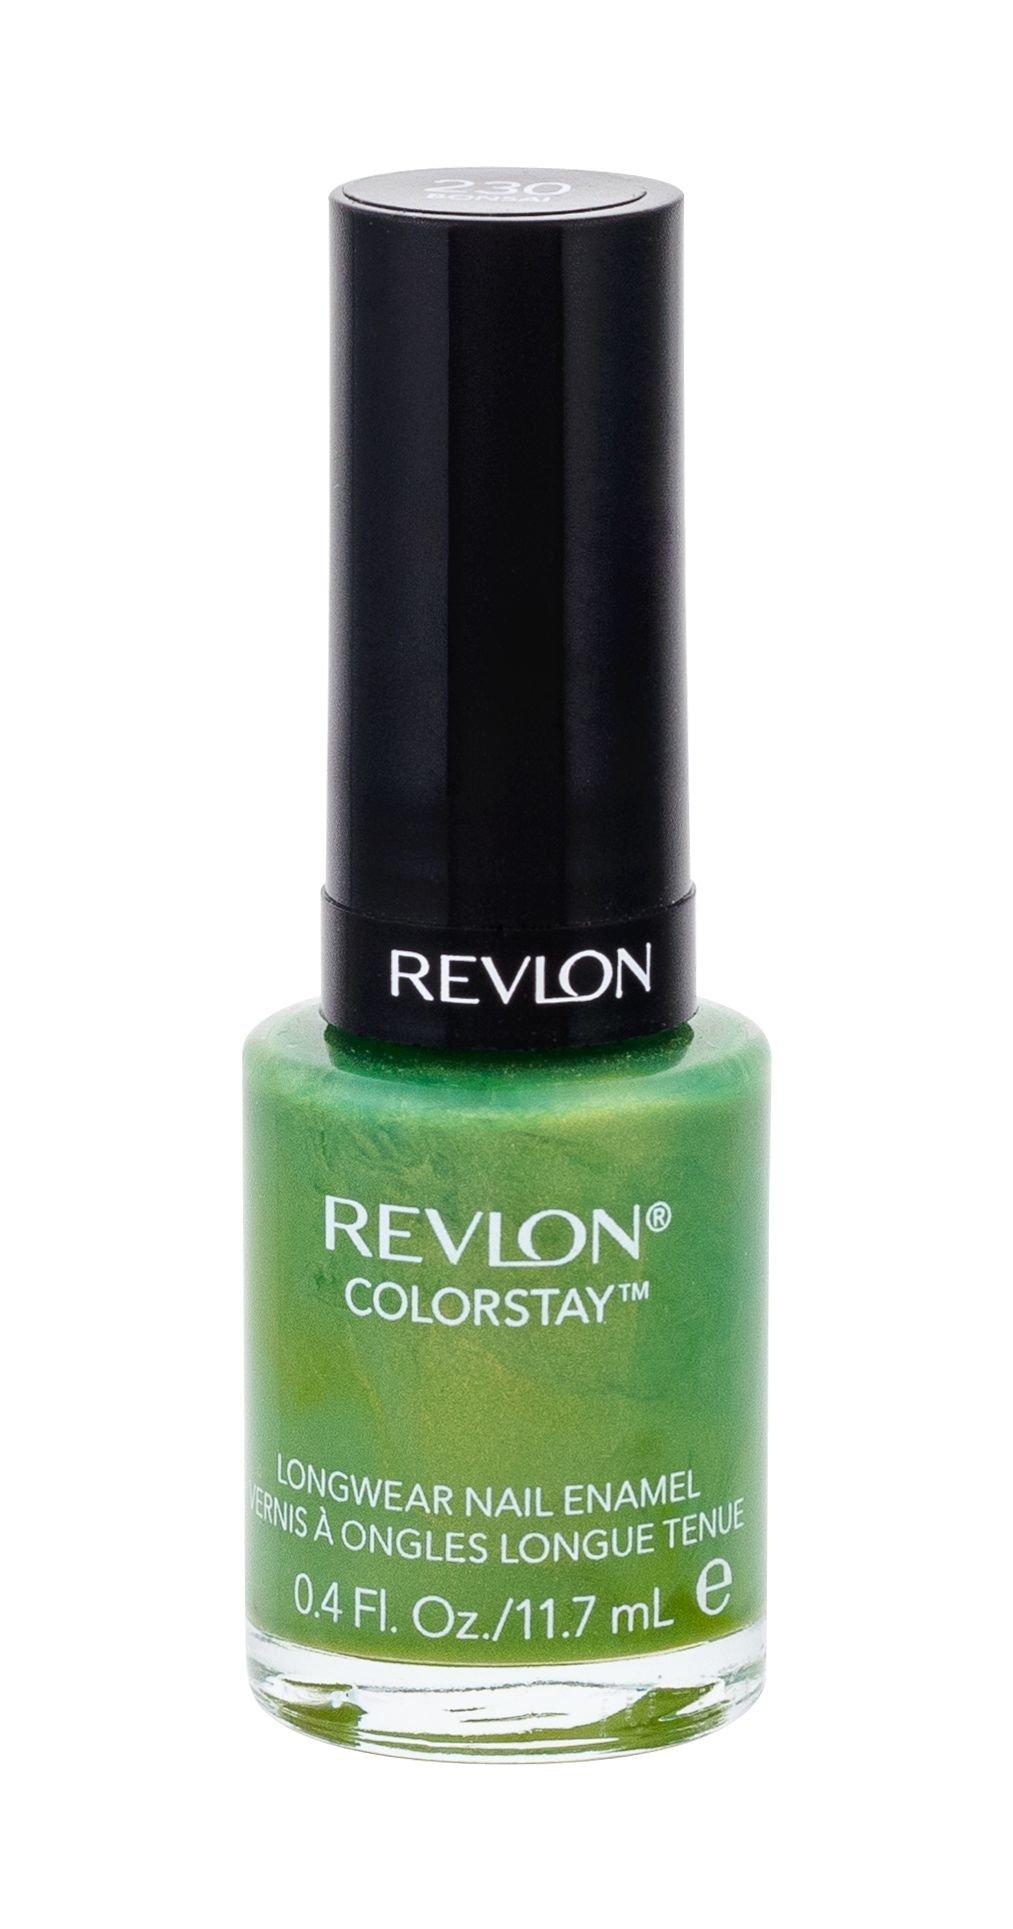 Revlon Colorstay Nail Polish 11,7ml 230 Bonsai